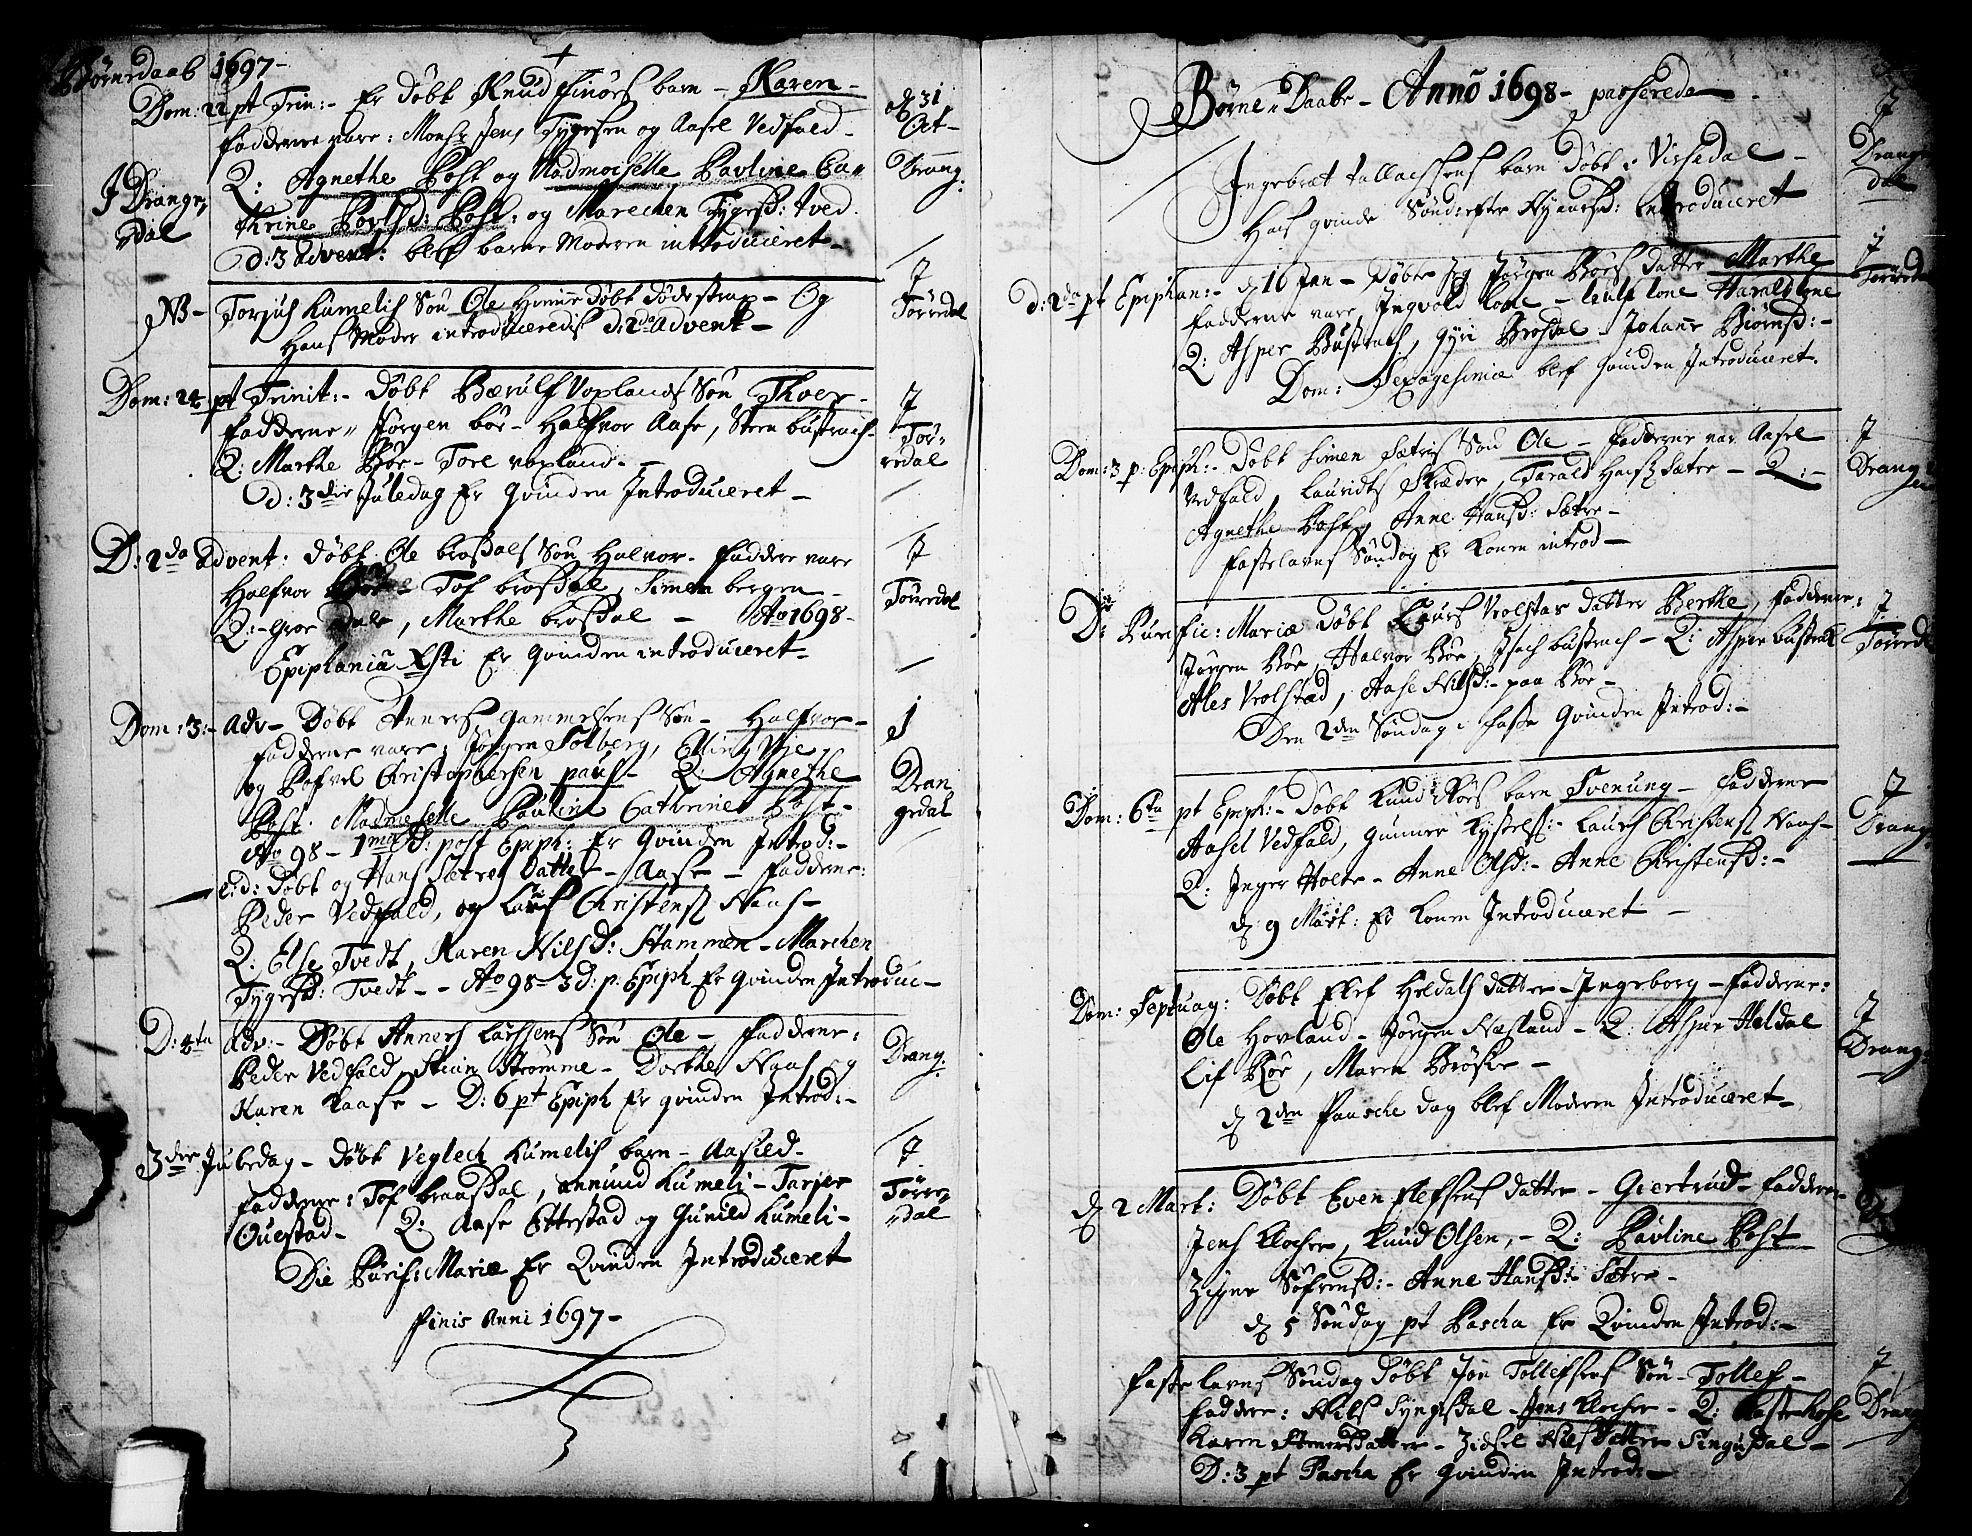 SAKO, Drangedal kirkebøker, F/Fa/L0001: Ministerialbok nr. 1, 1697-1767, s. 3